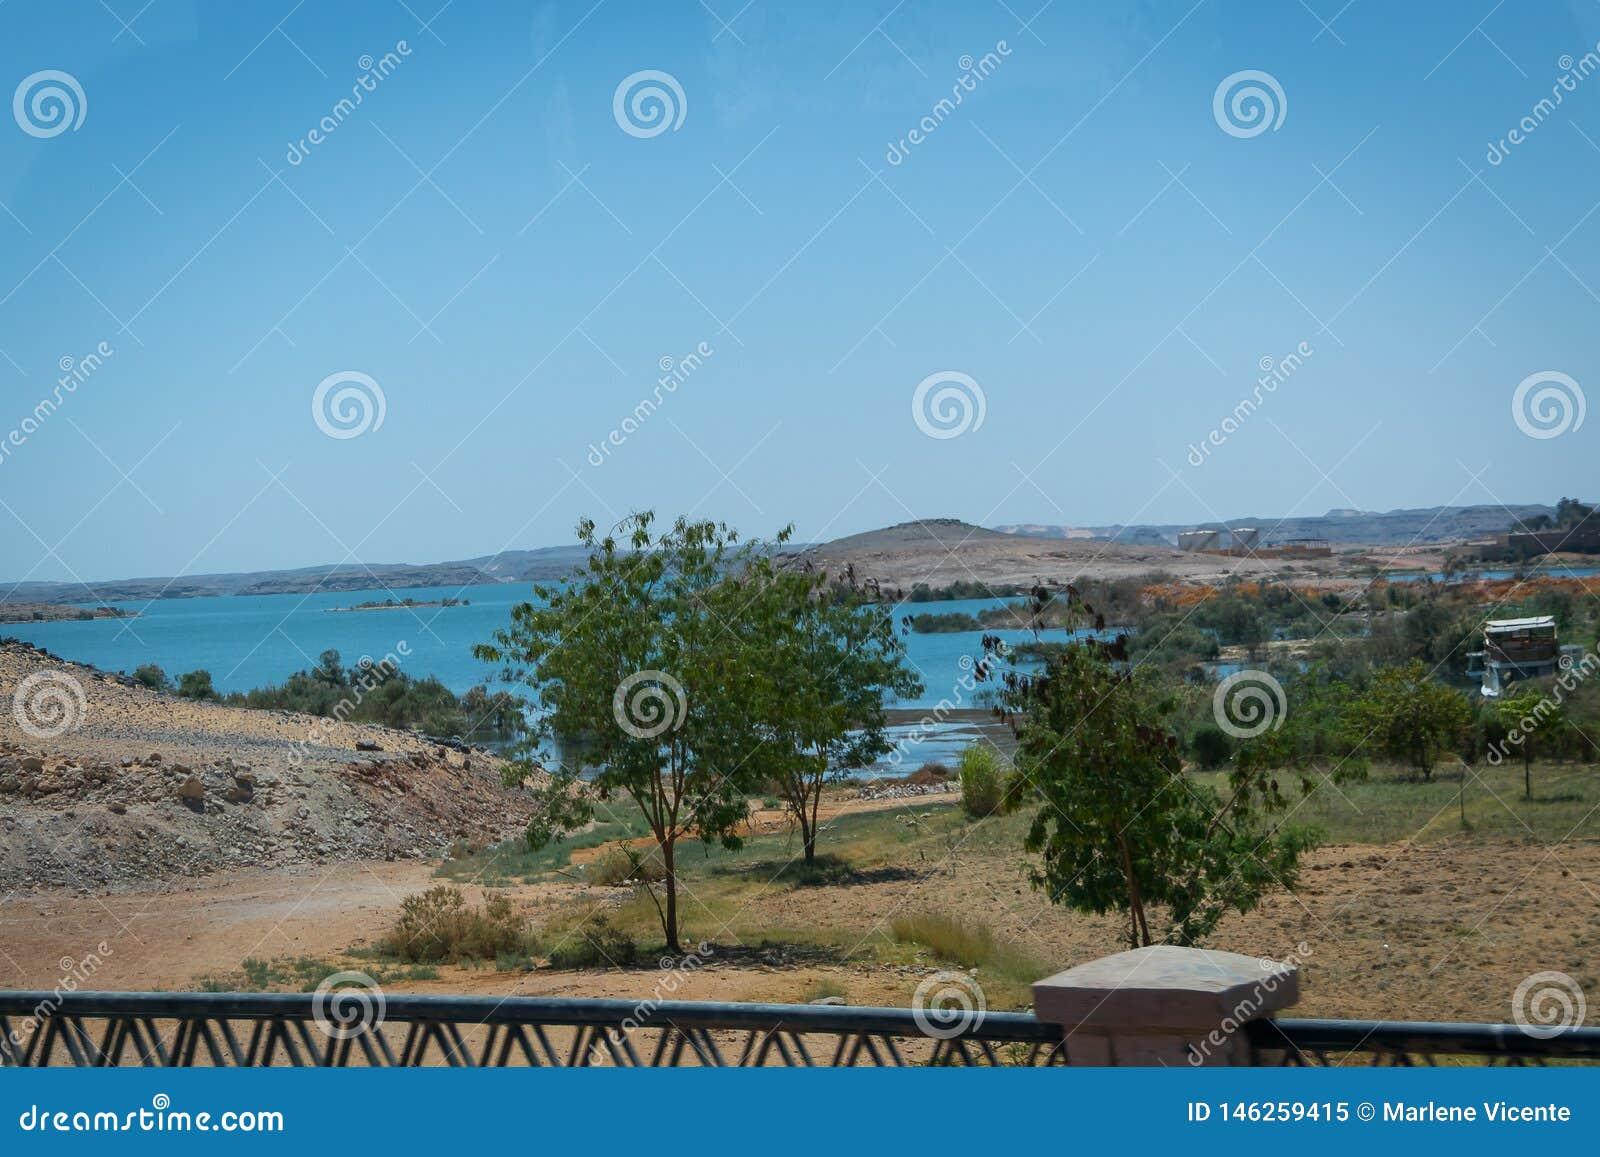 Egipto El lago Nasser al lado de Abu Simbel Temple